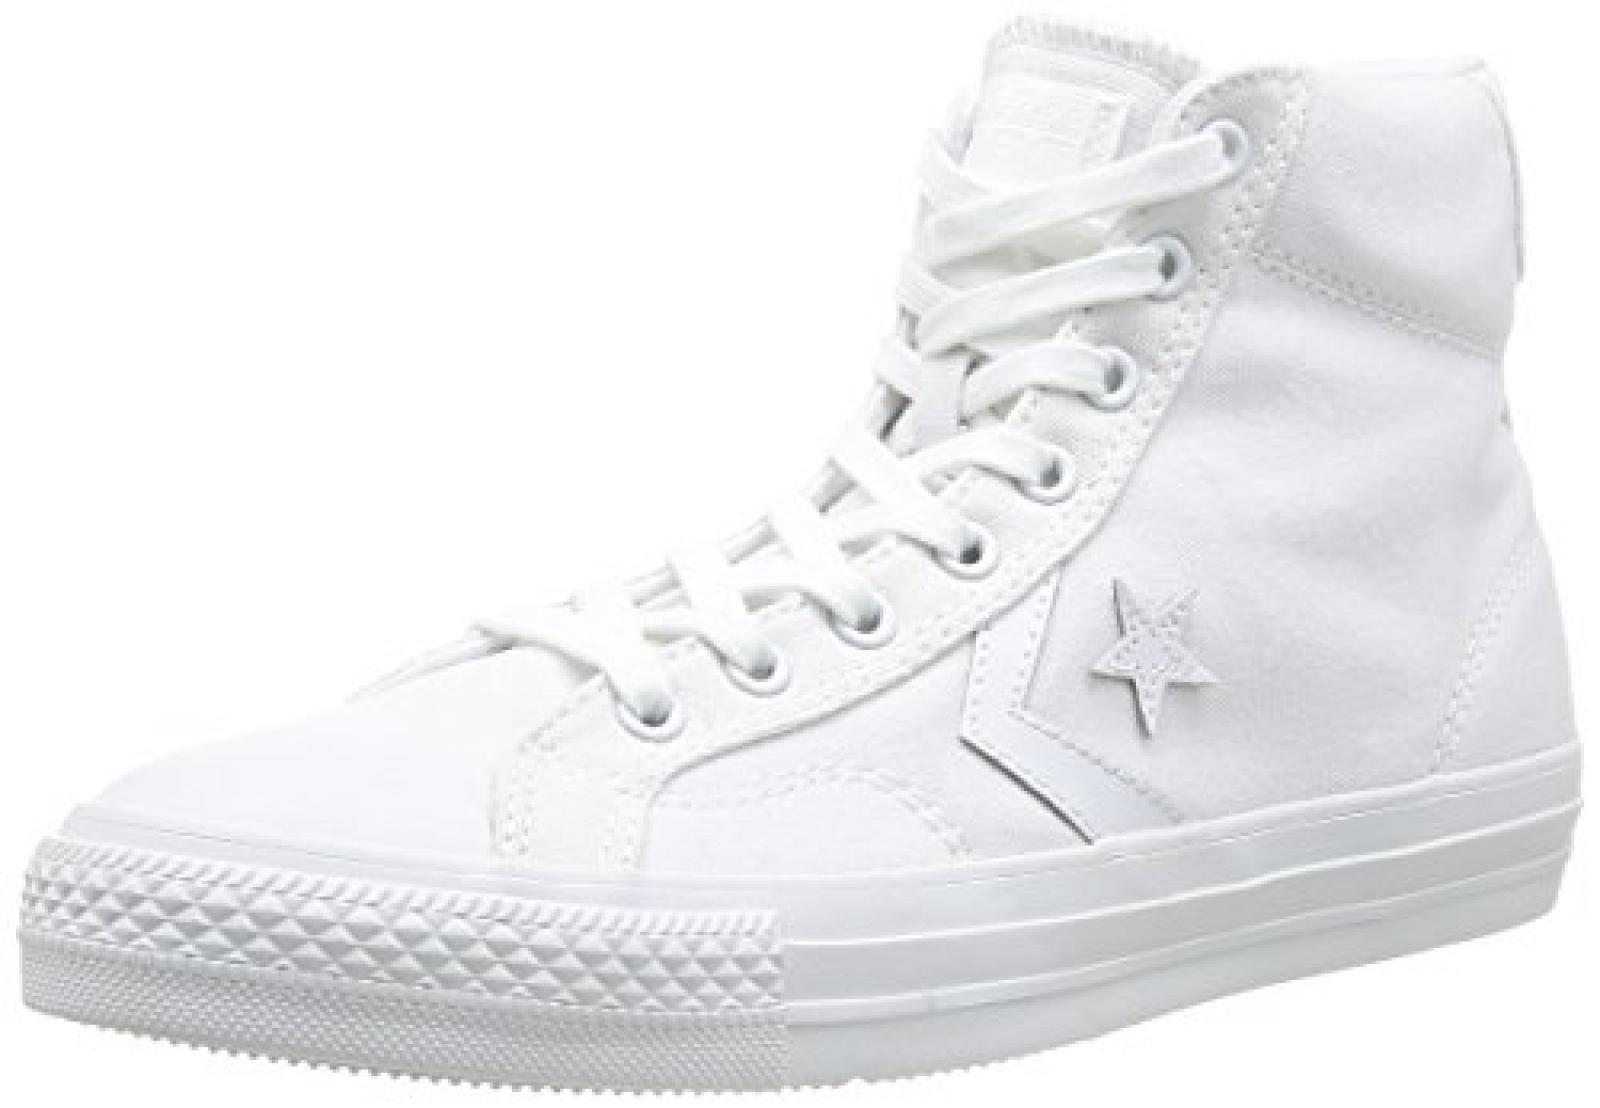 Converse Star Player Adulte Mono Cvs Hi 383000 Unisex - Erwachsene Sneaker